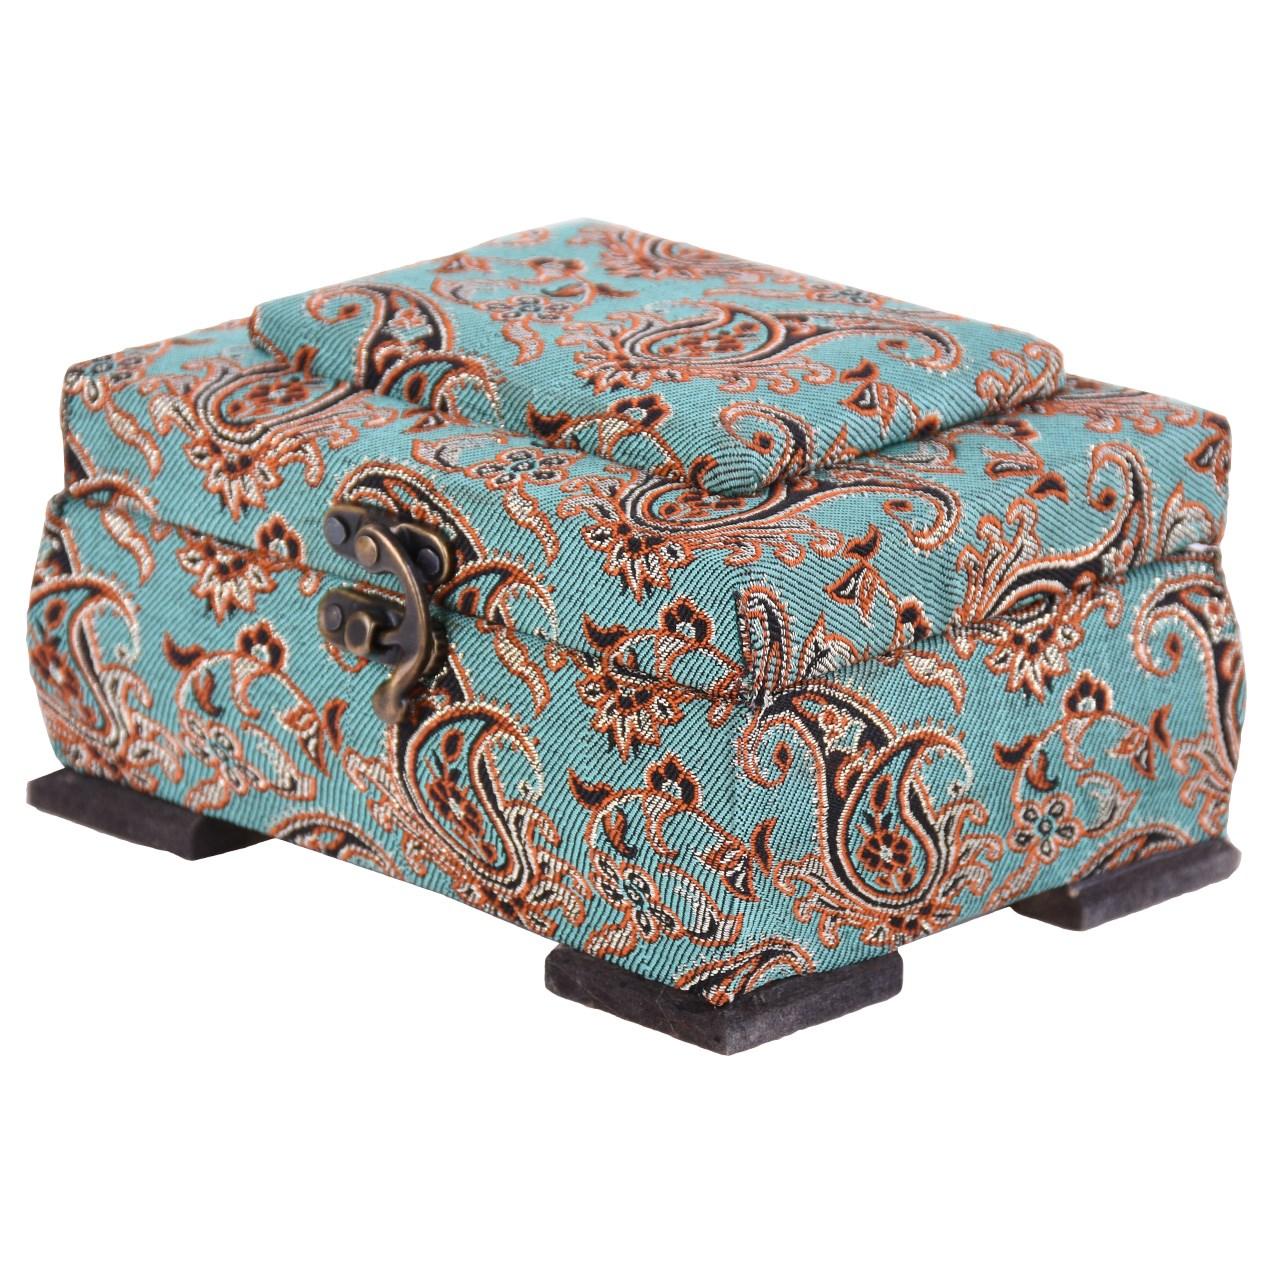 جعبه چوبی پایا چرم طرح ترمه مدل 02-01 سایز کوچک